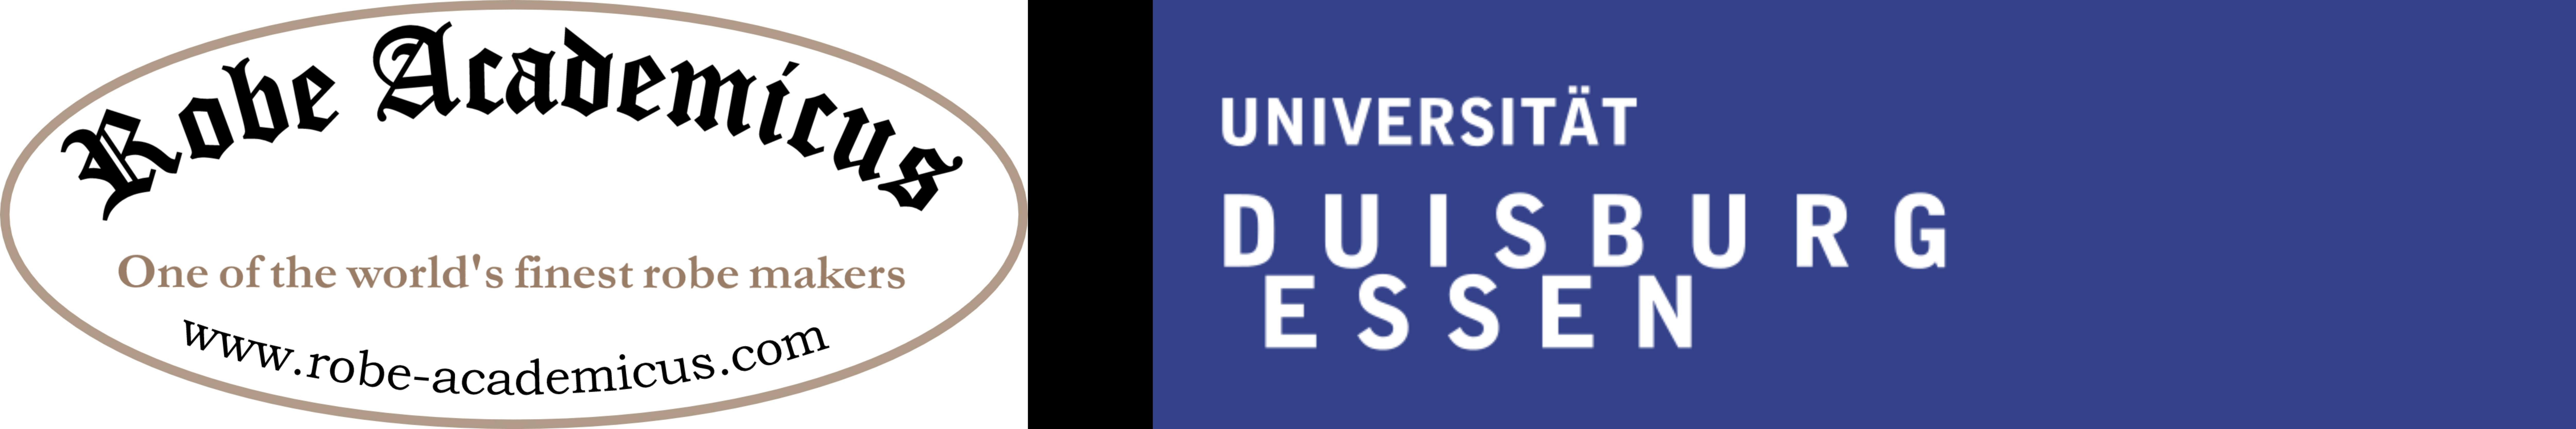 robe-academicus.uni-due.de